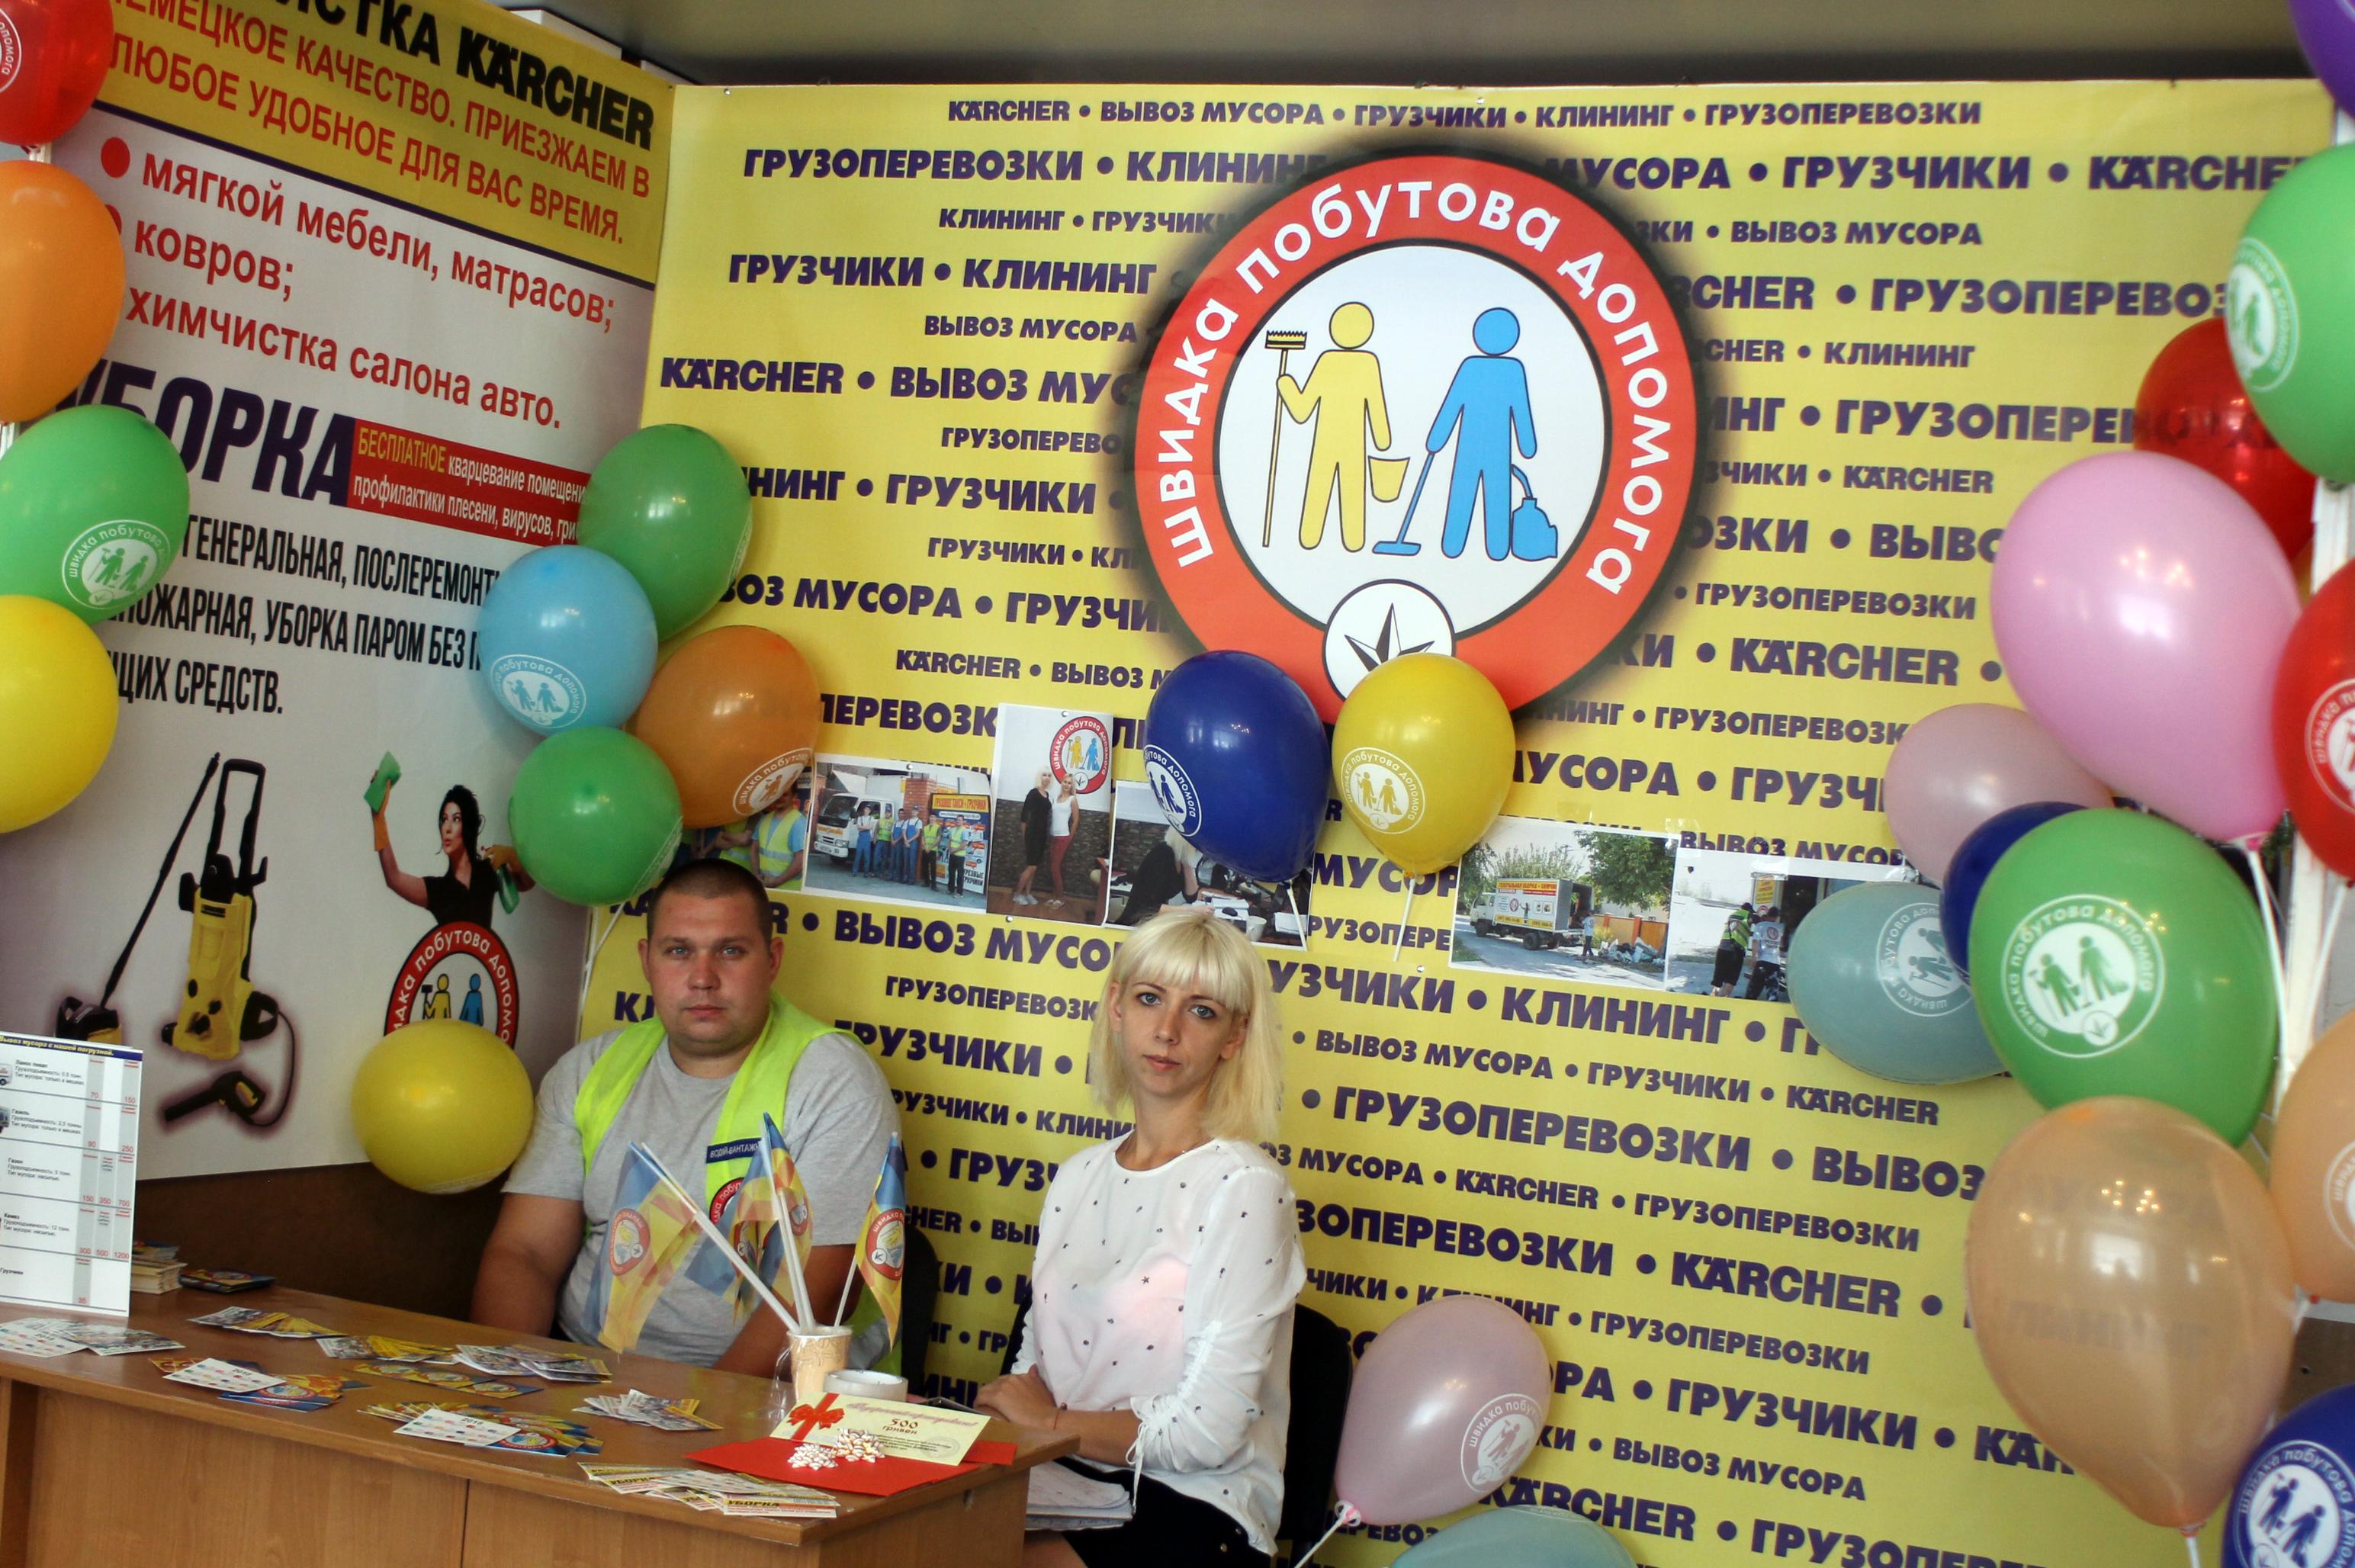 Виставка-ярмарок «Nikopol EXPO 2017»   Прихист